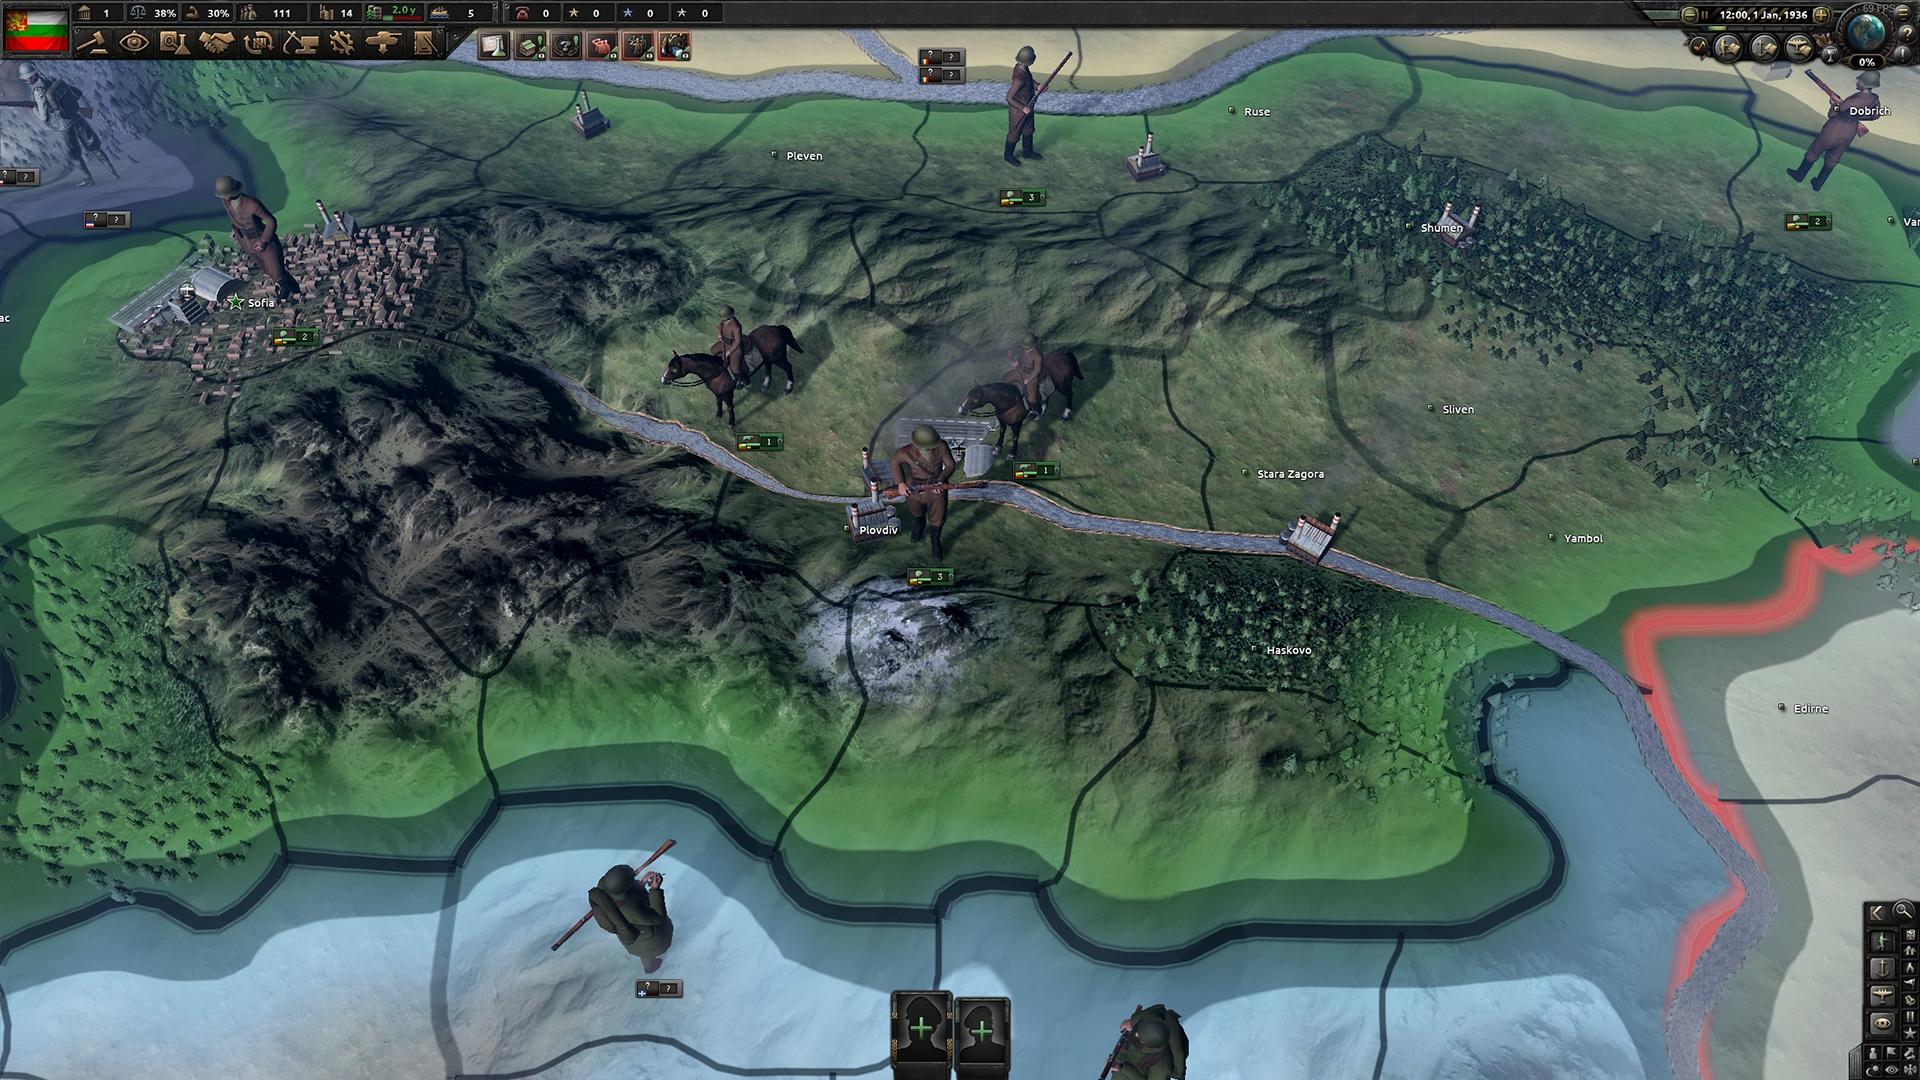 Hearts of Iron IV: Battle for the Bosporus   ROW (284395f1-0ba0-4dad-bbf9-8a1065b4ac33)